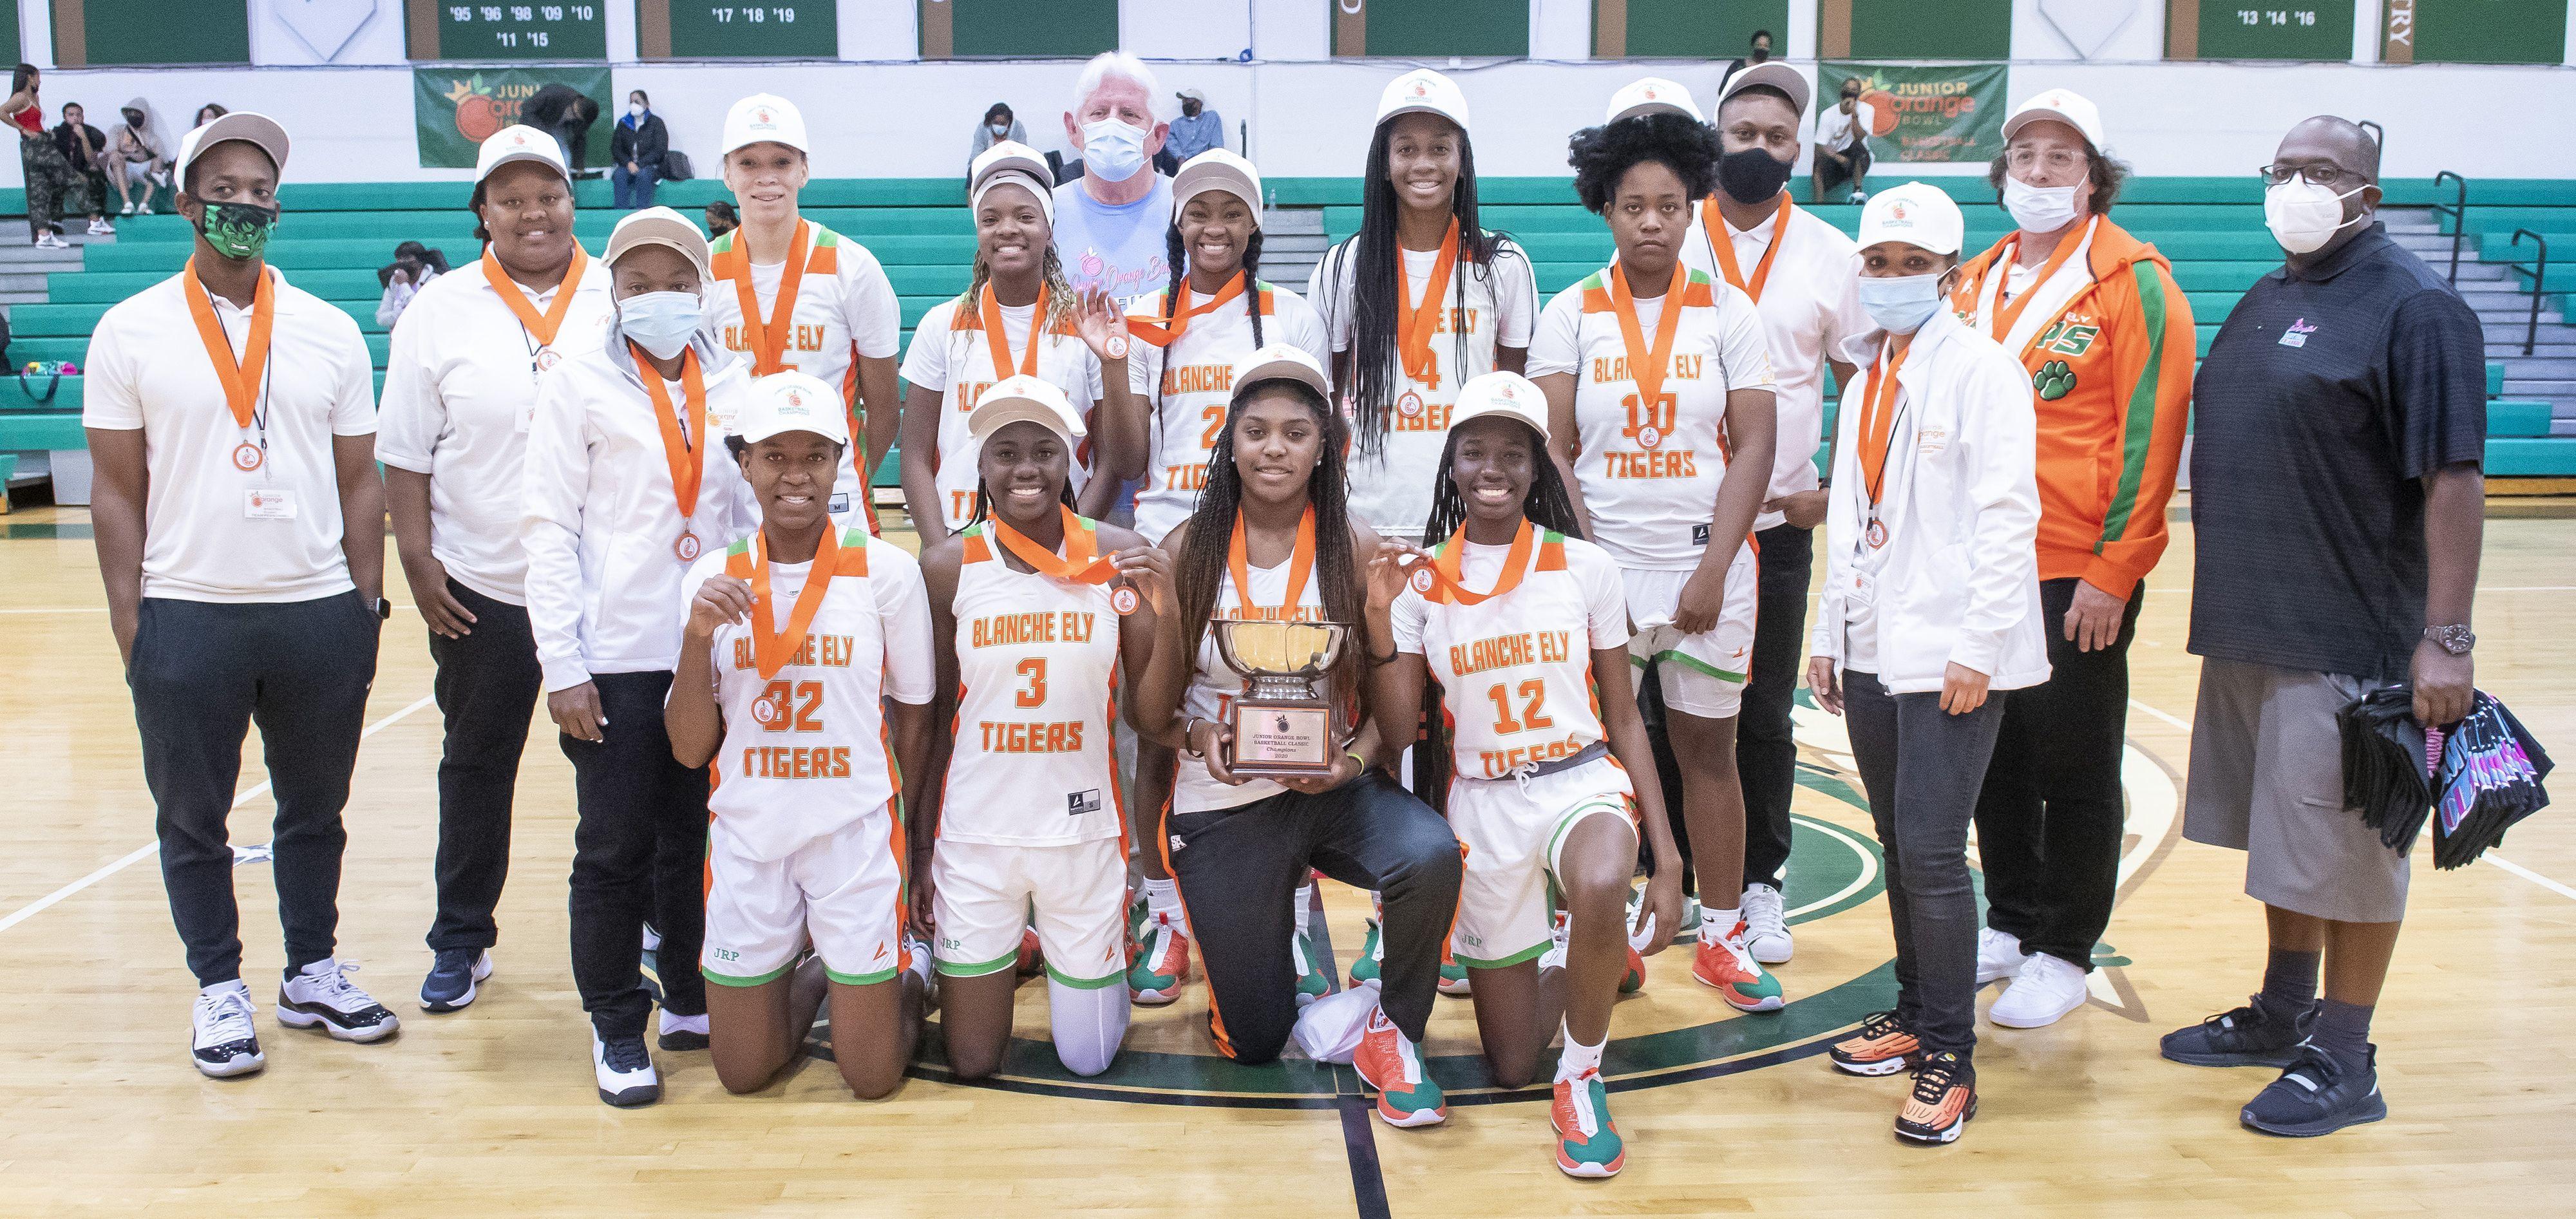 Kendall Gazette - Girls' Basketball Classic Champions - Pompano Beach Blache Ely